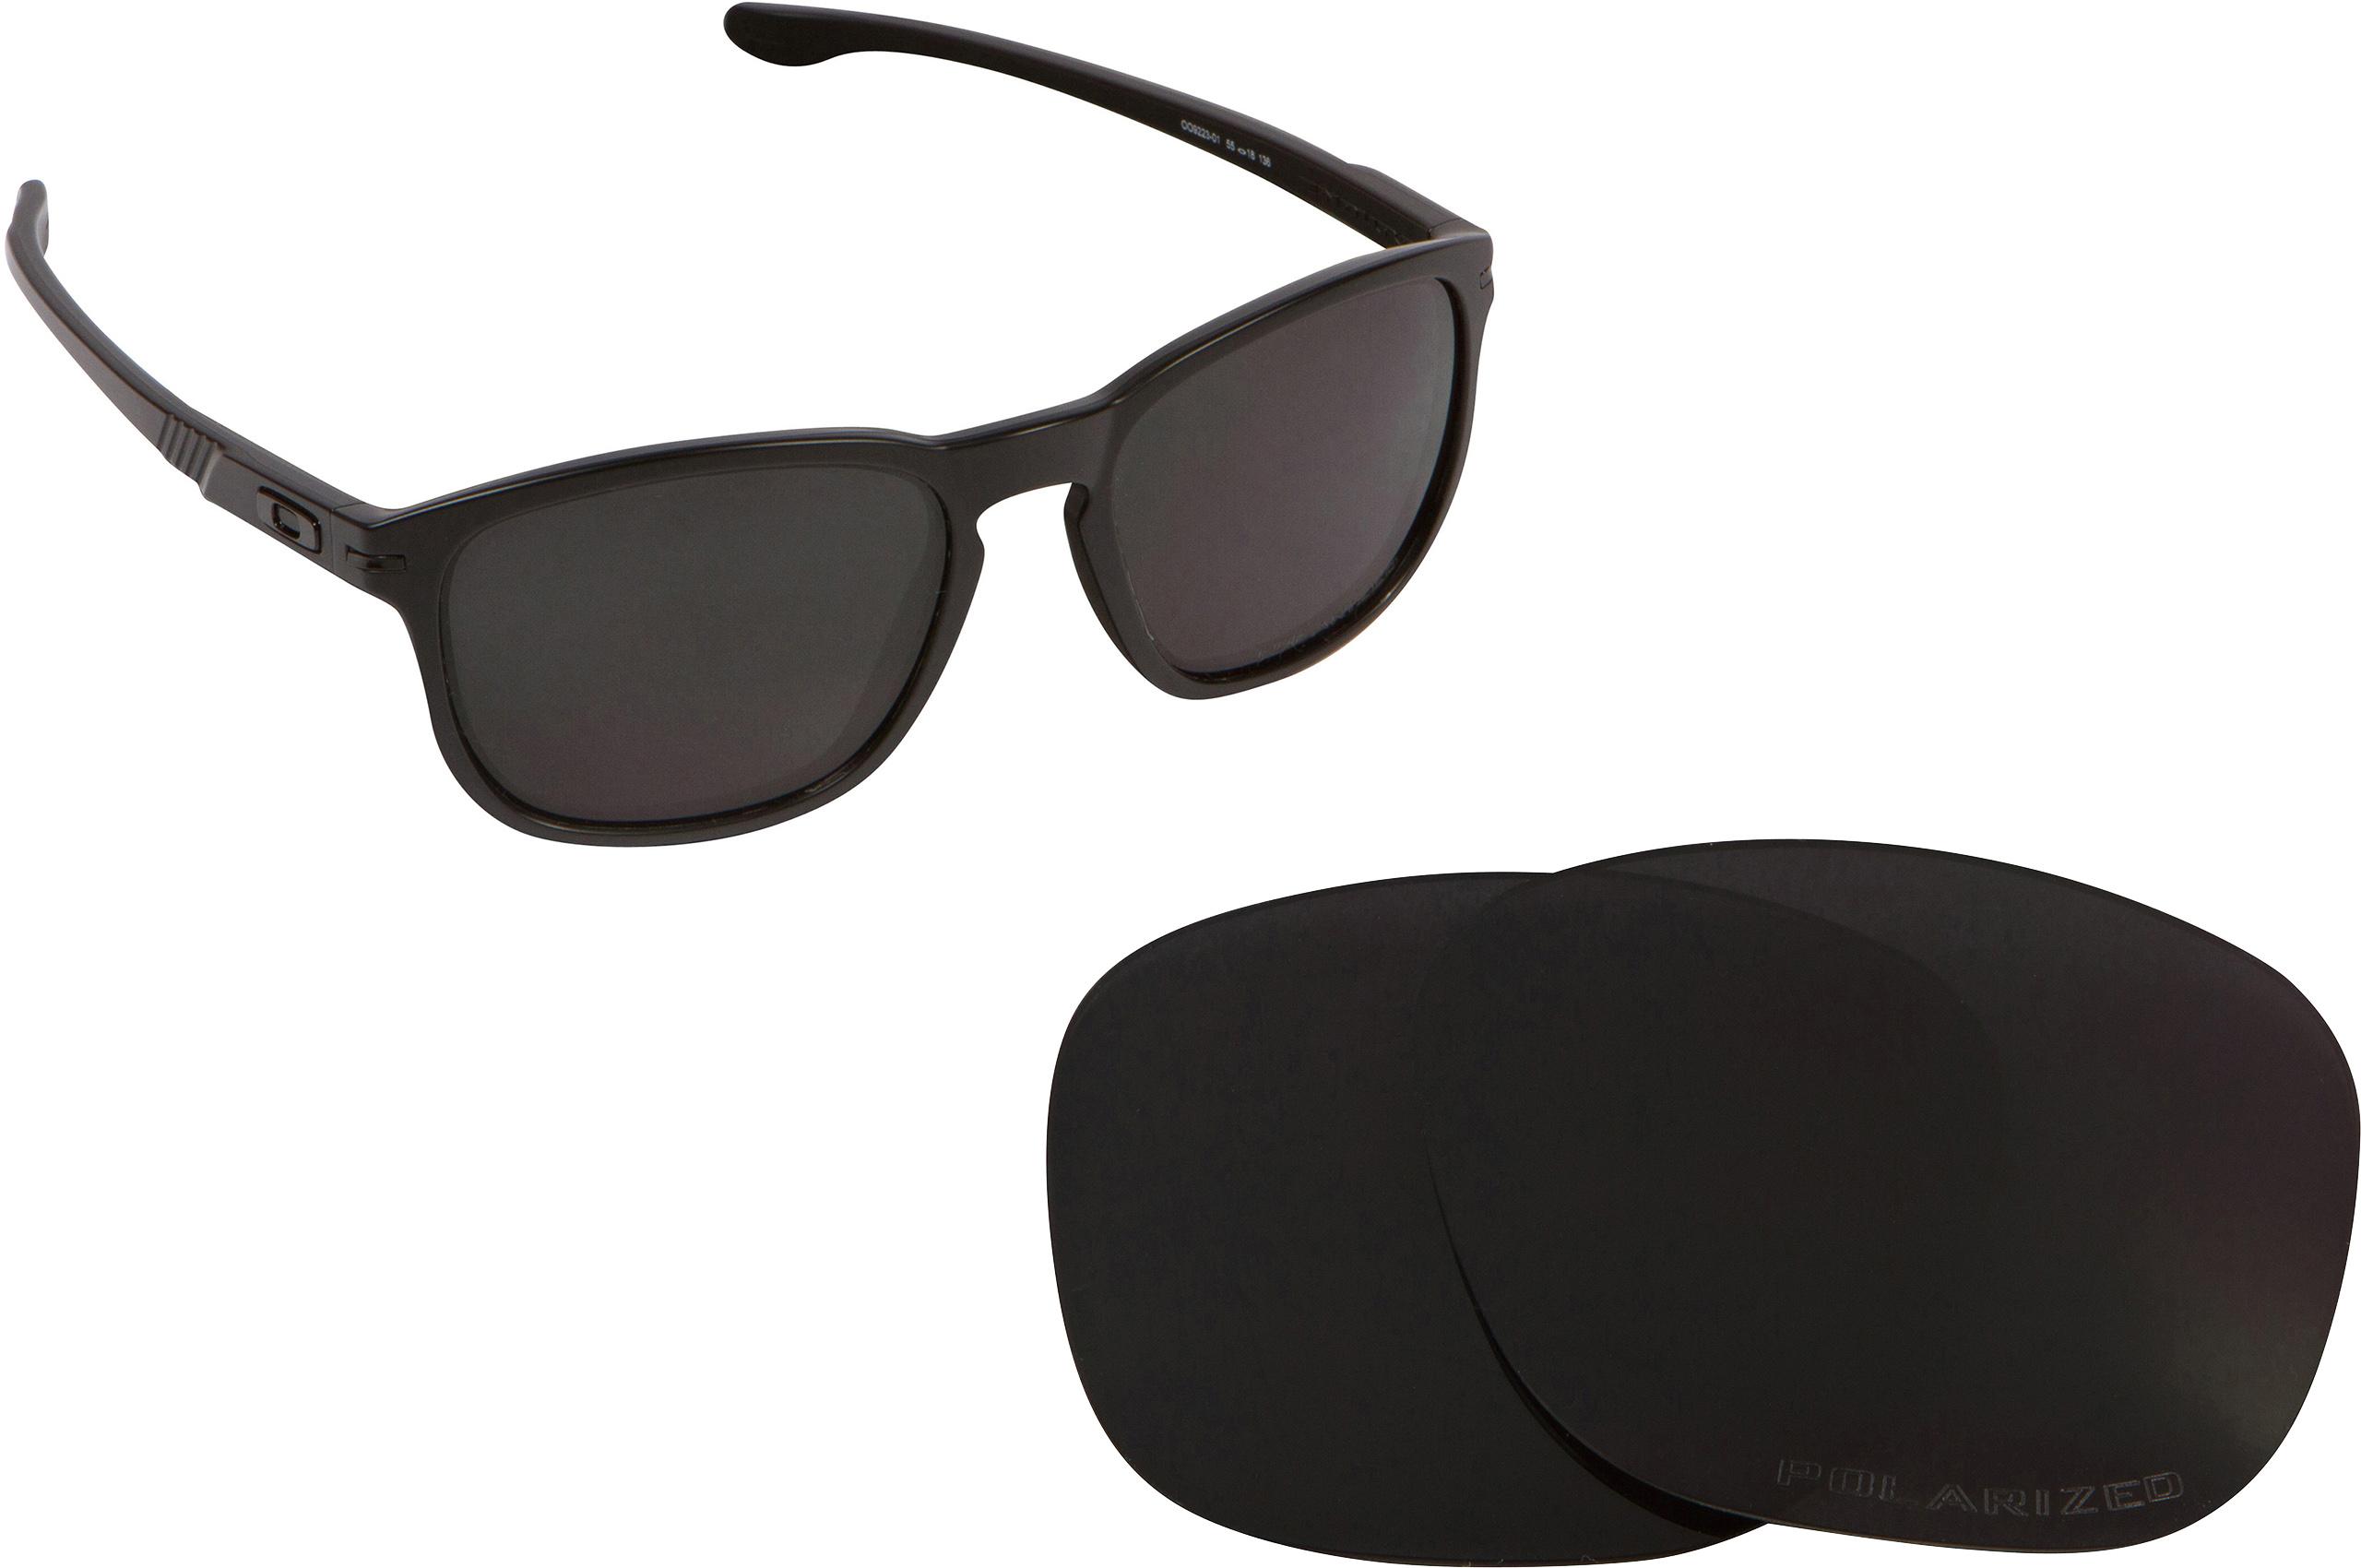 54c0bf7a18 New SEEK OPTICS Replacement Lenses Oakley ENDURO - Polarized Black - Tanga